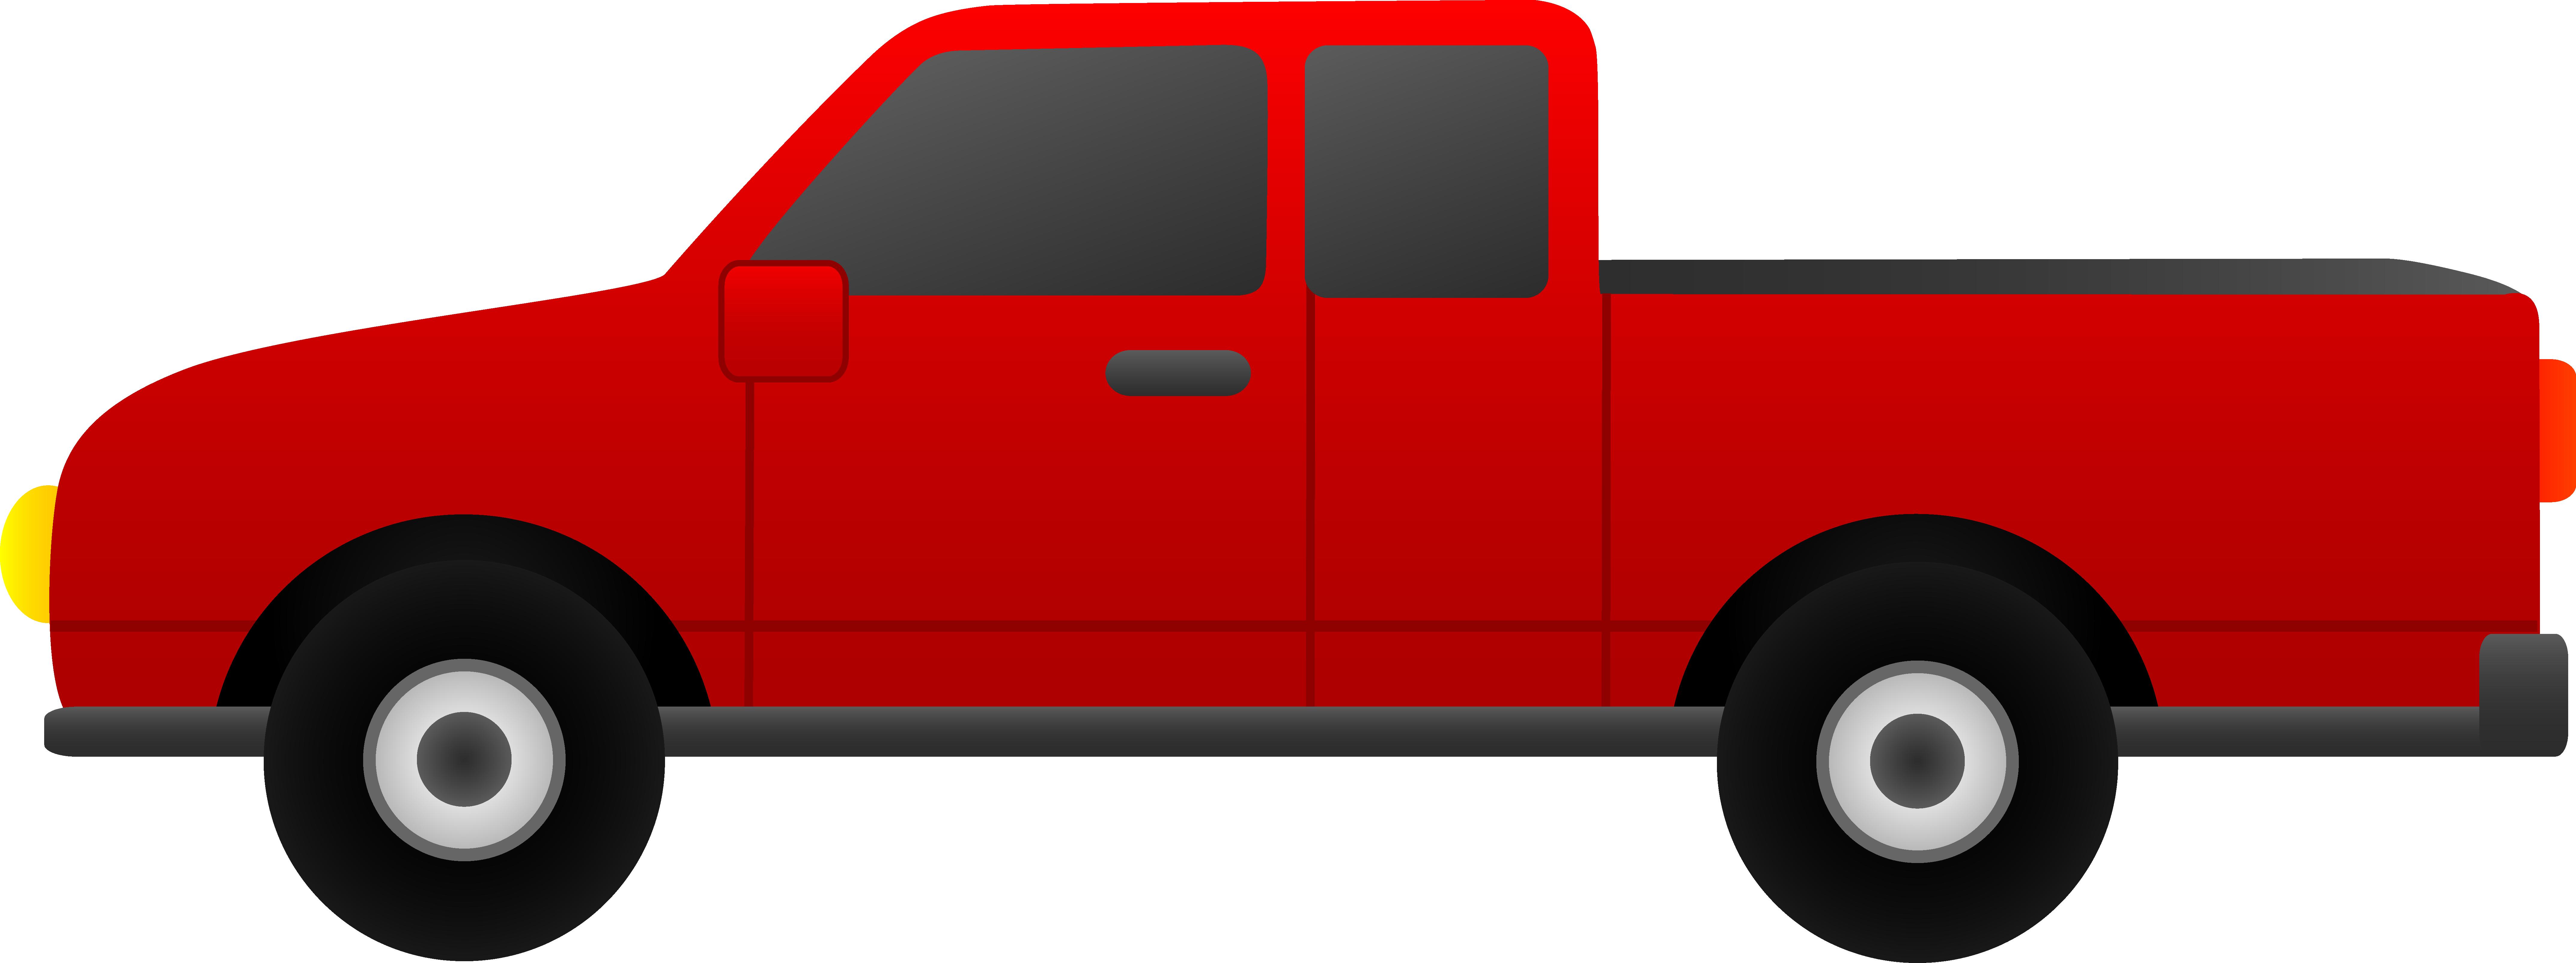 8576x3207 Pickup Truck Clipart Black And White Clipart Panda